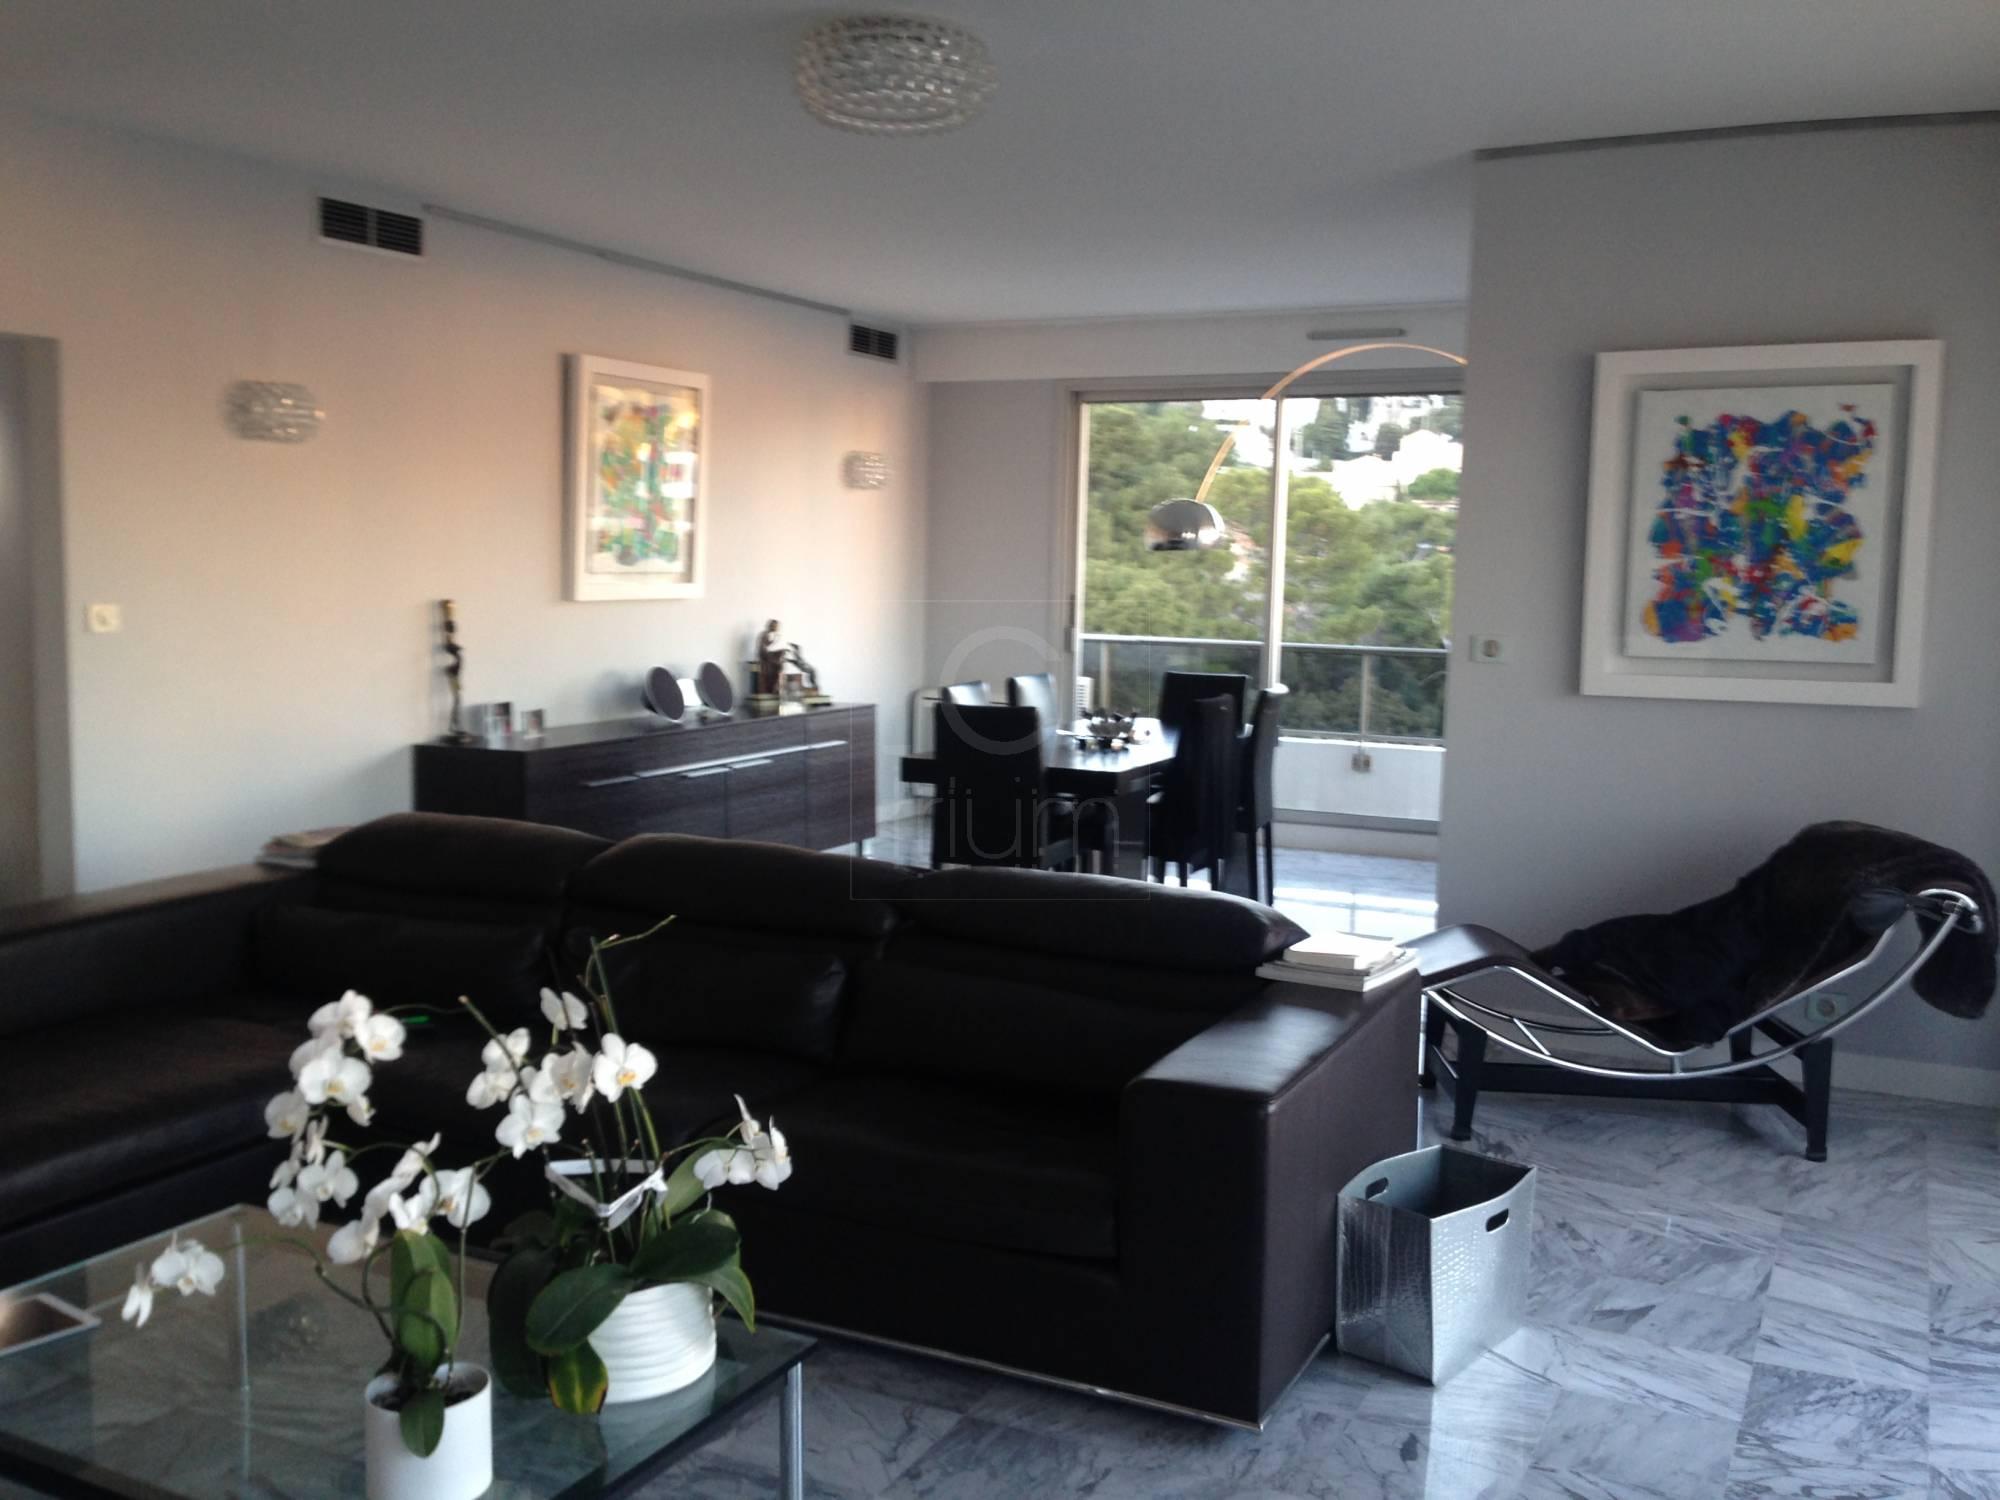 Vente appartement t4 f4 marseille 8eme cadenelle vue mer for Agence immobiliere vente appartement